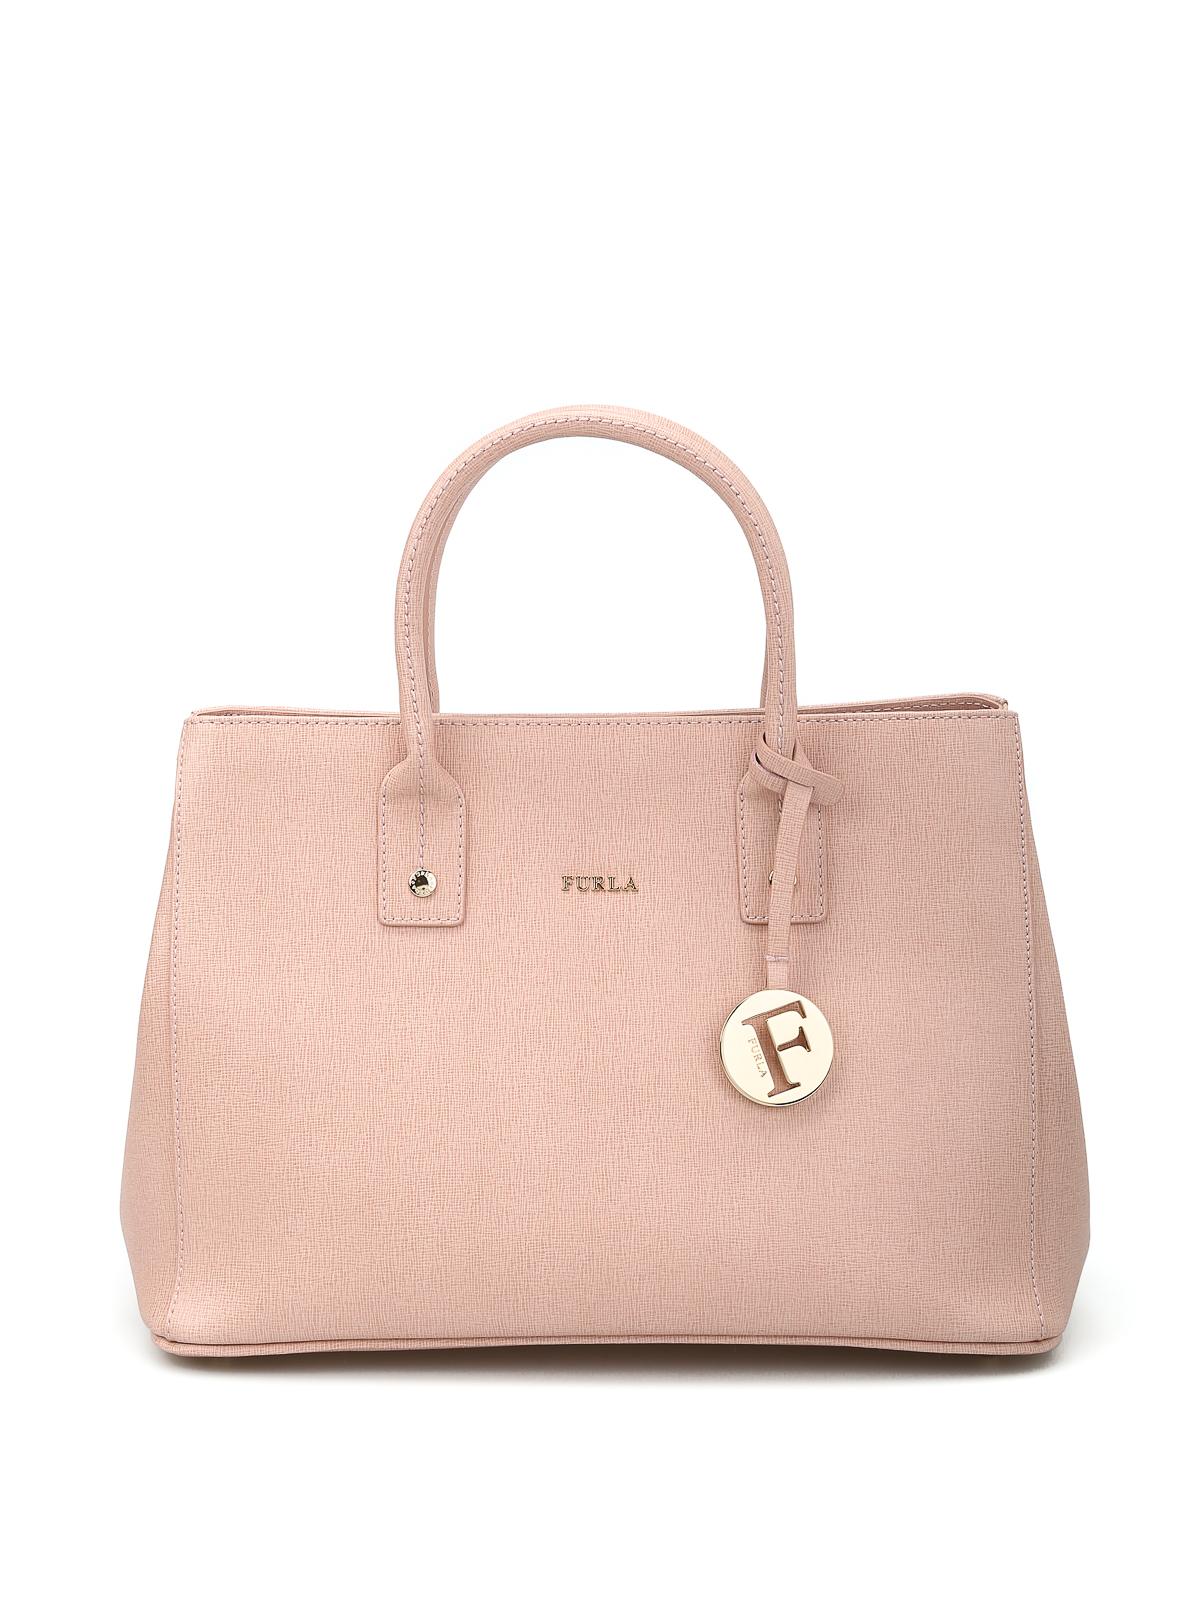 Linda Saffiano Tote Bag By Furla Totes Bags IKRIX